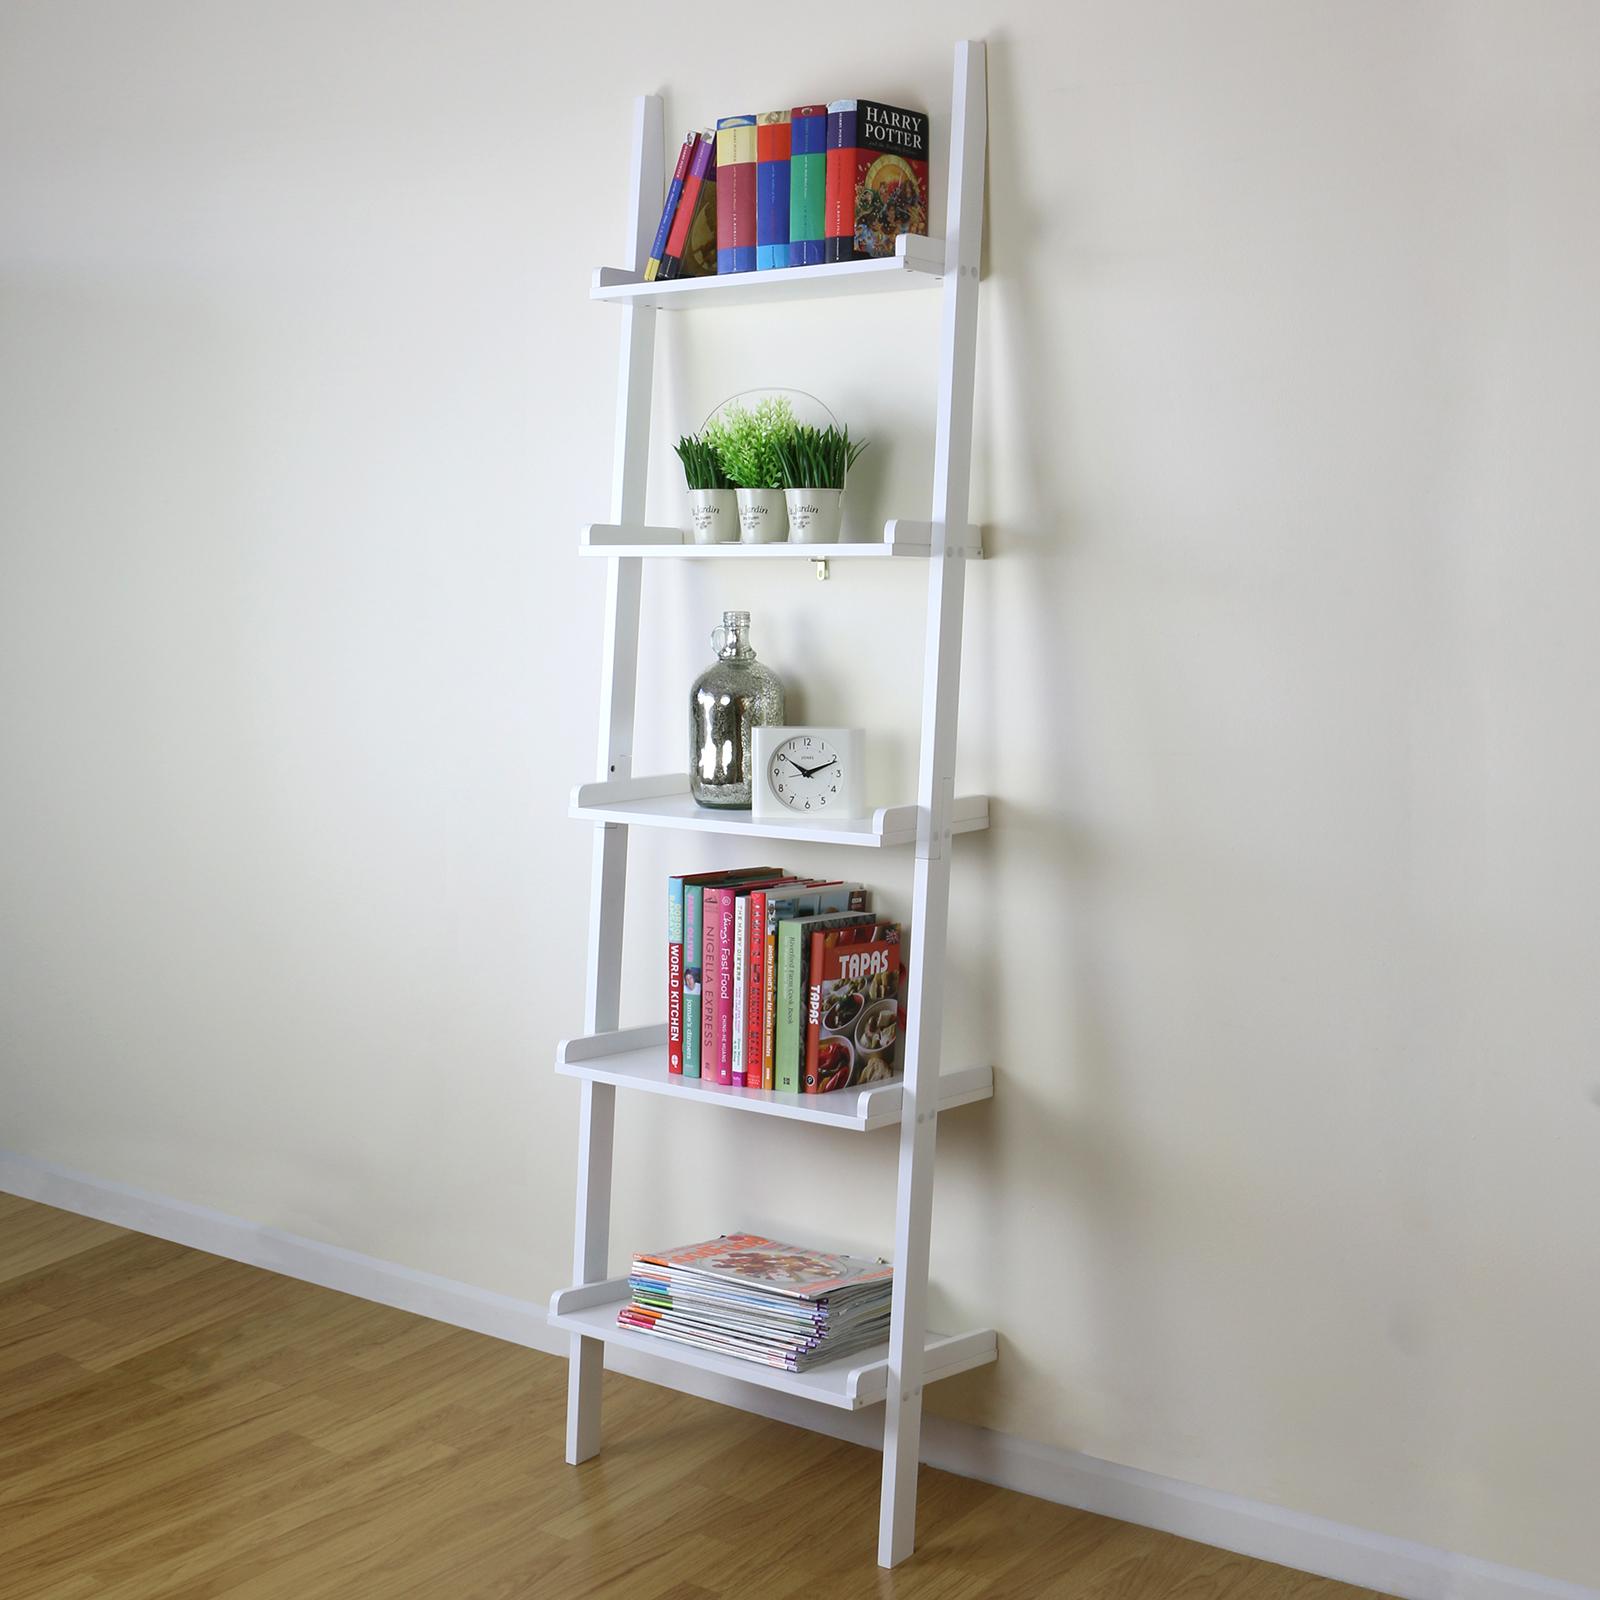 5 Tier White Ladder Wall Shelf Home Storage/Display Unit